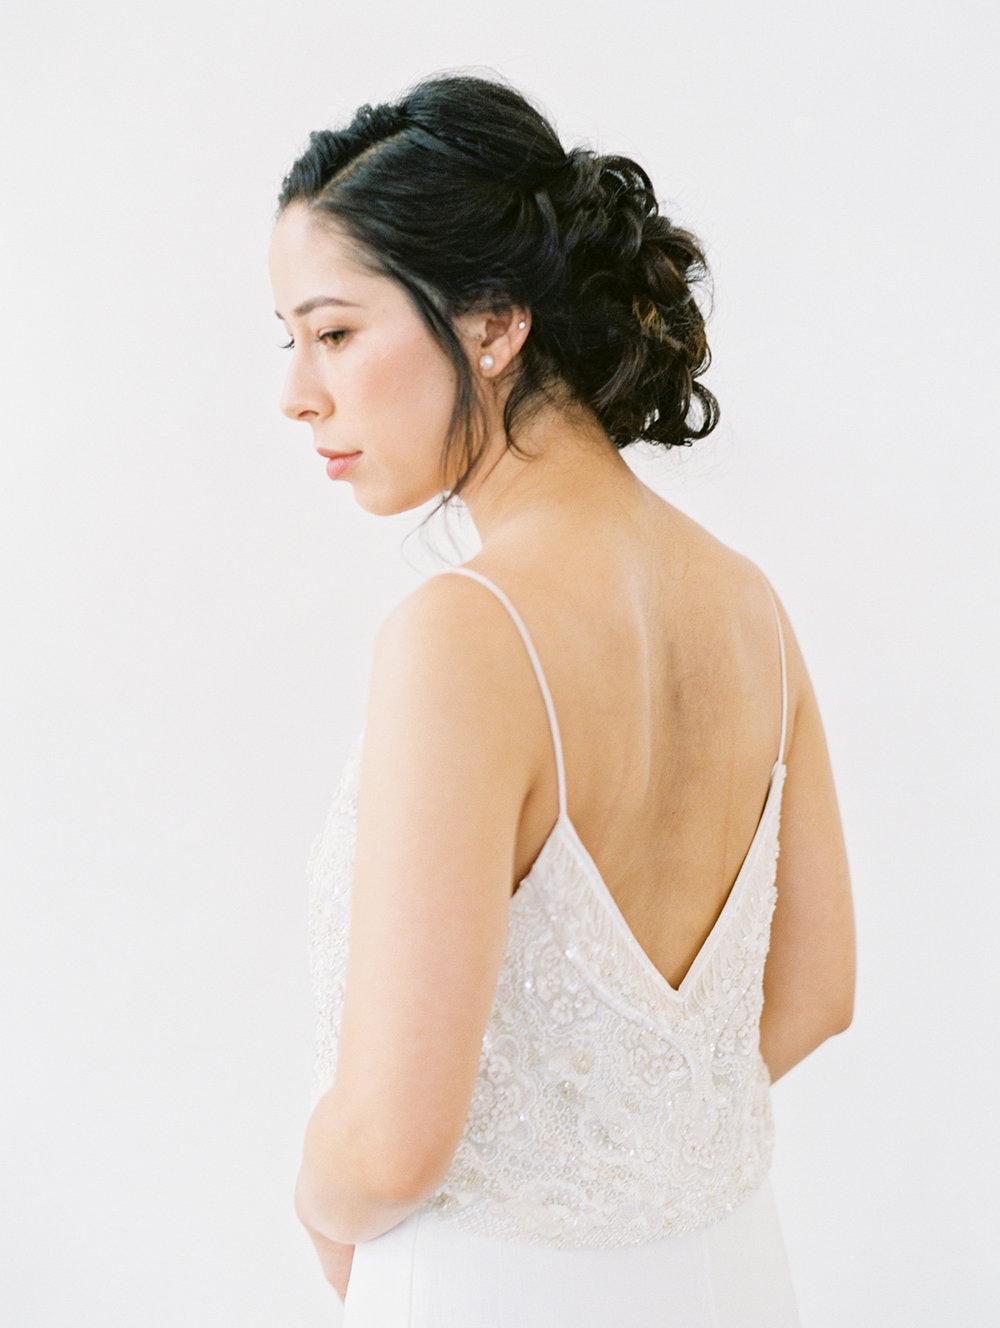 Jon-Cu-San-Diego-Film-Wedding-Photographer883020500-R1-E011.jpg